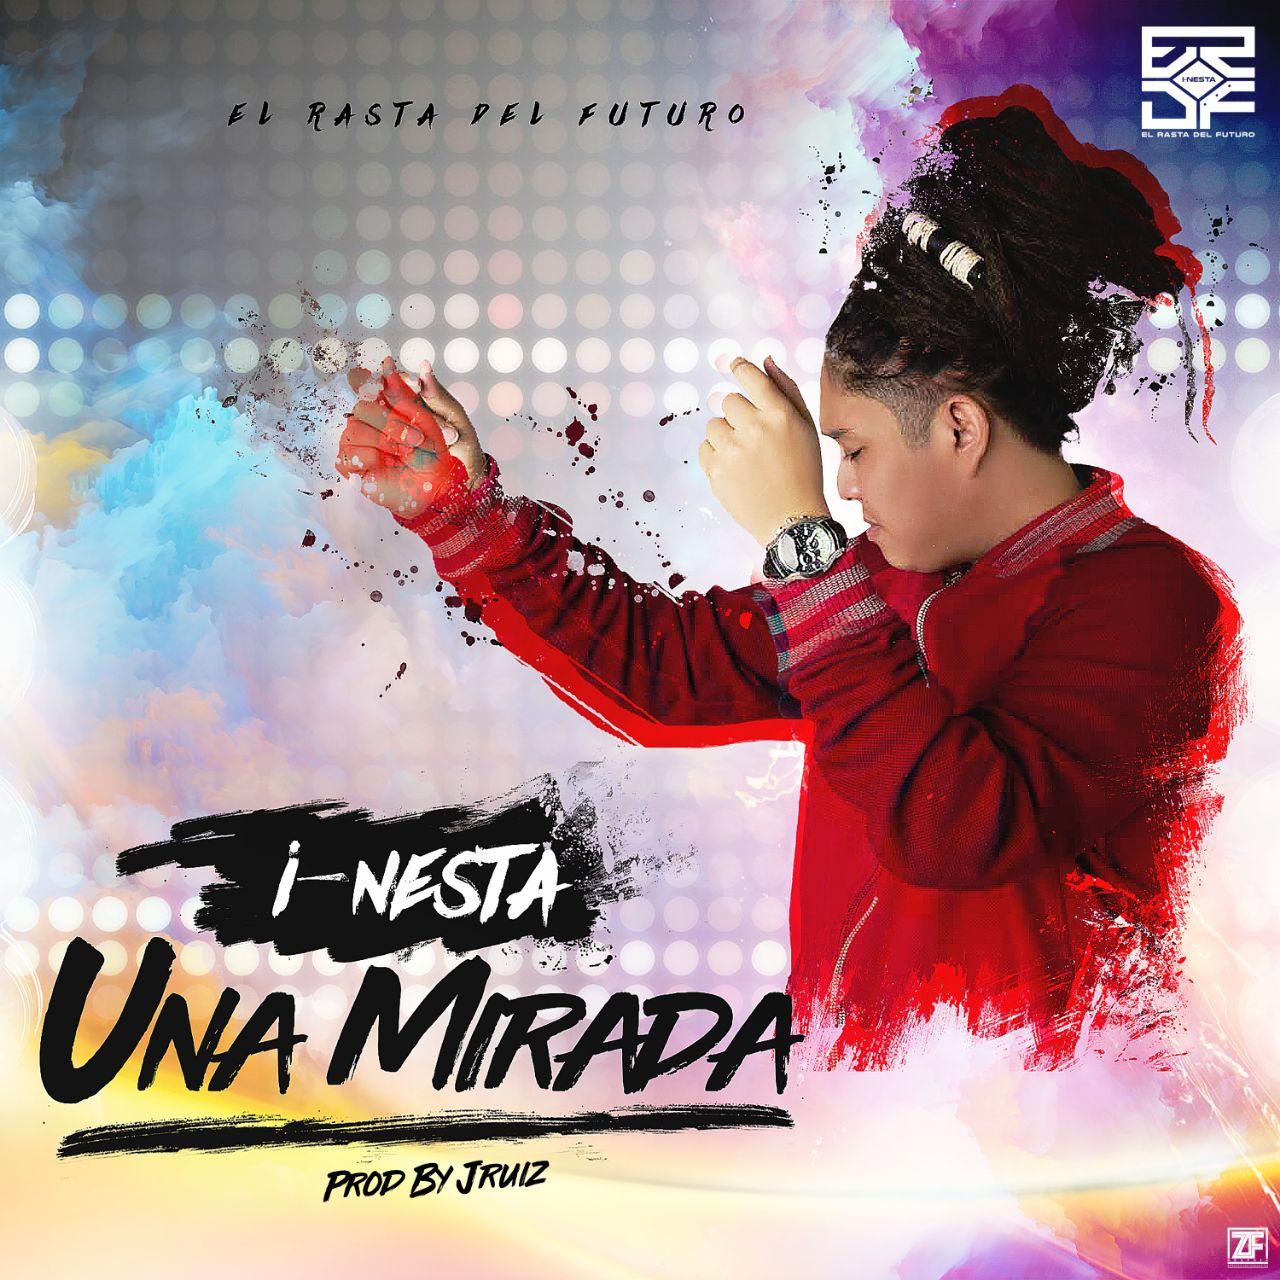 Photo of I Nesta presenta  'Una Mirada